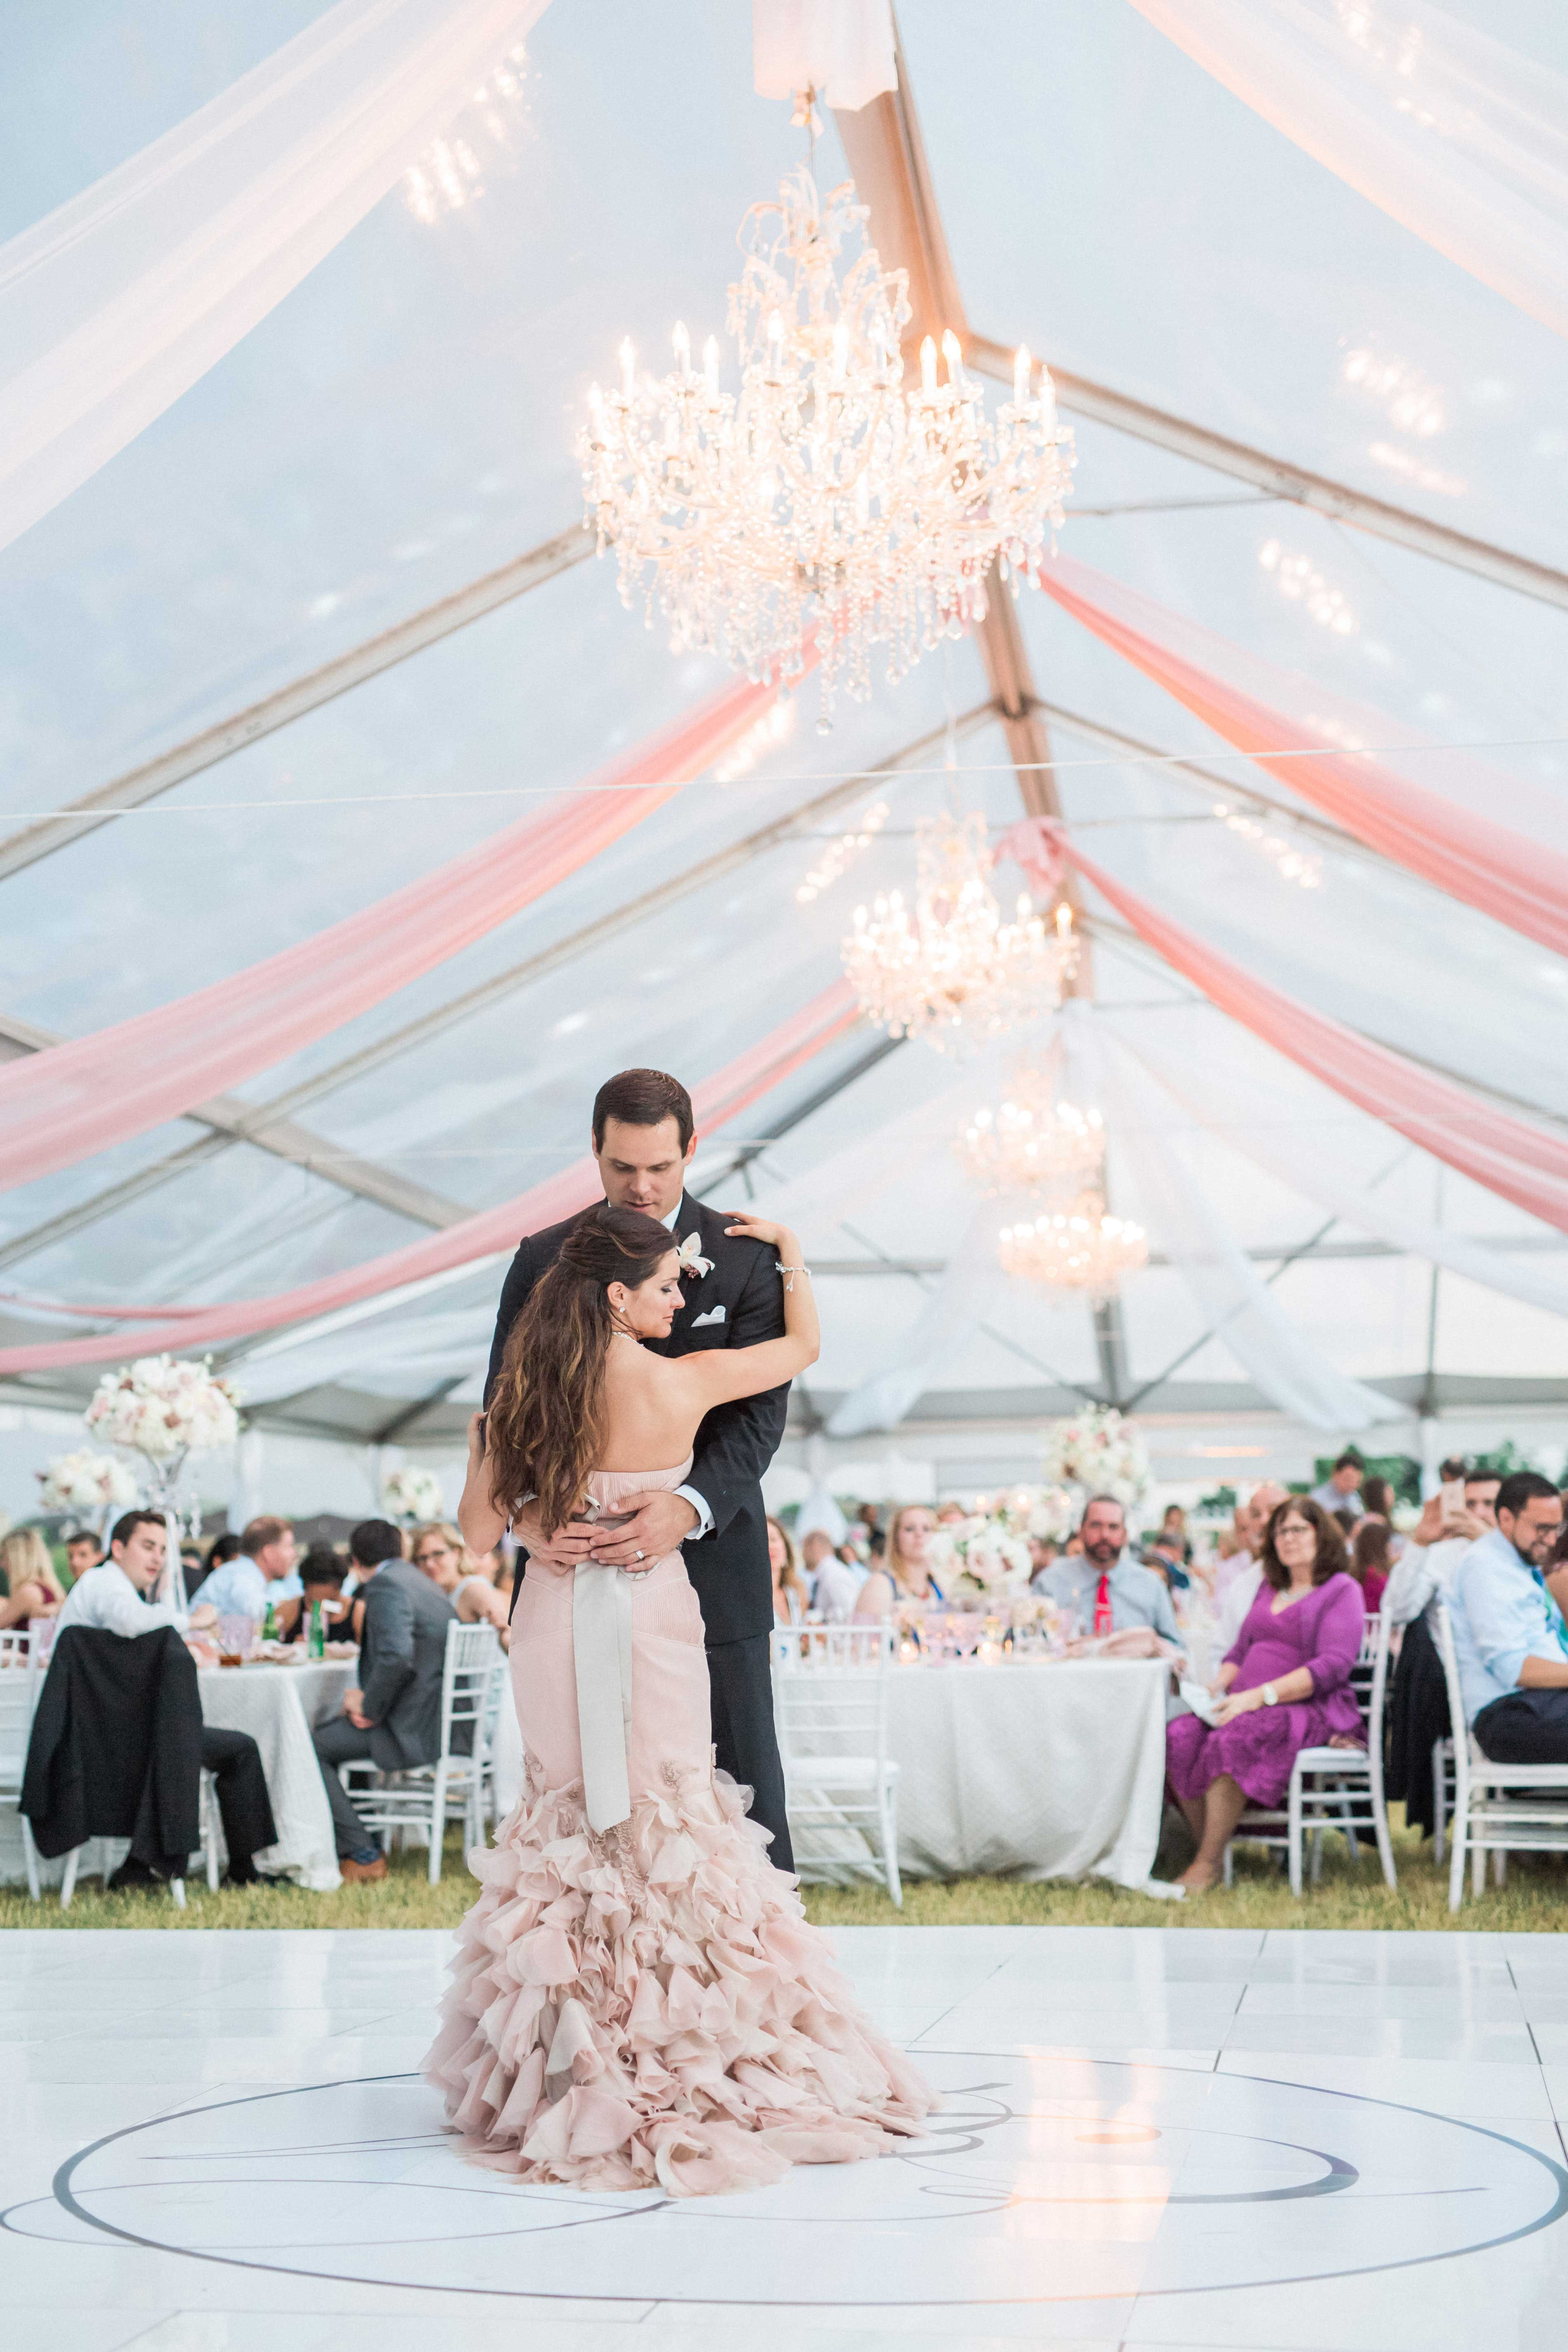 Pink bridal gown wedding dress first dance floor outdoor wedding reception